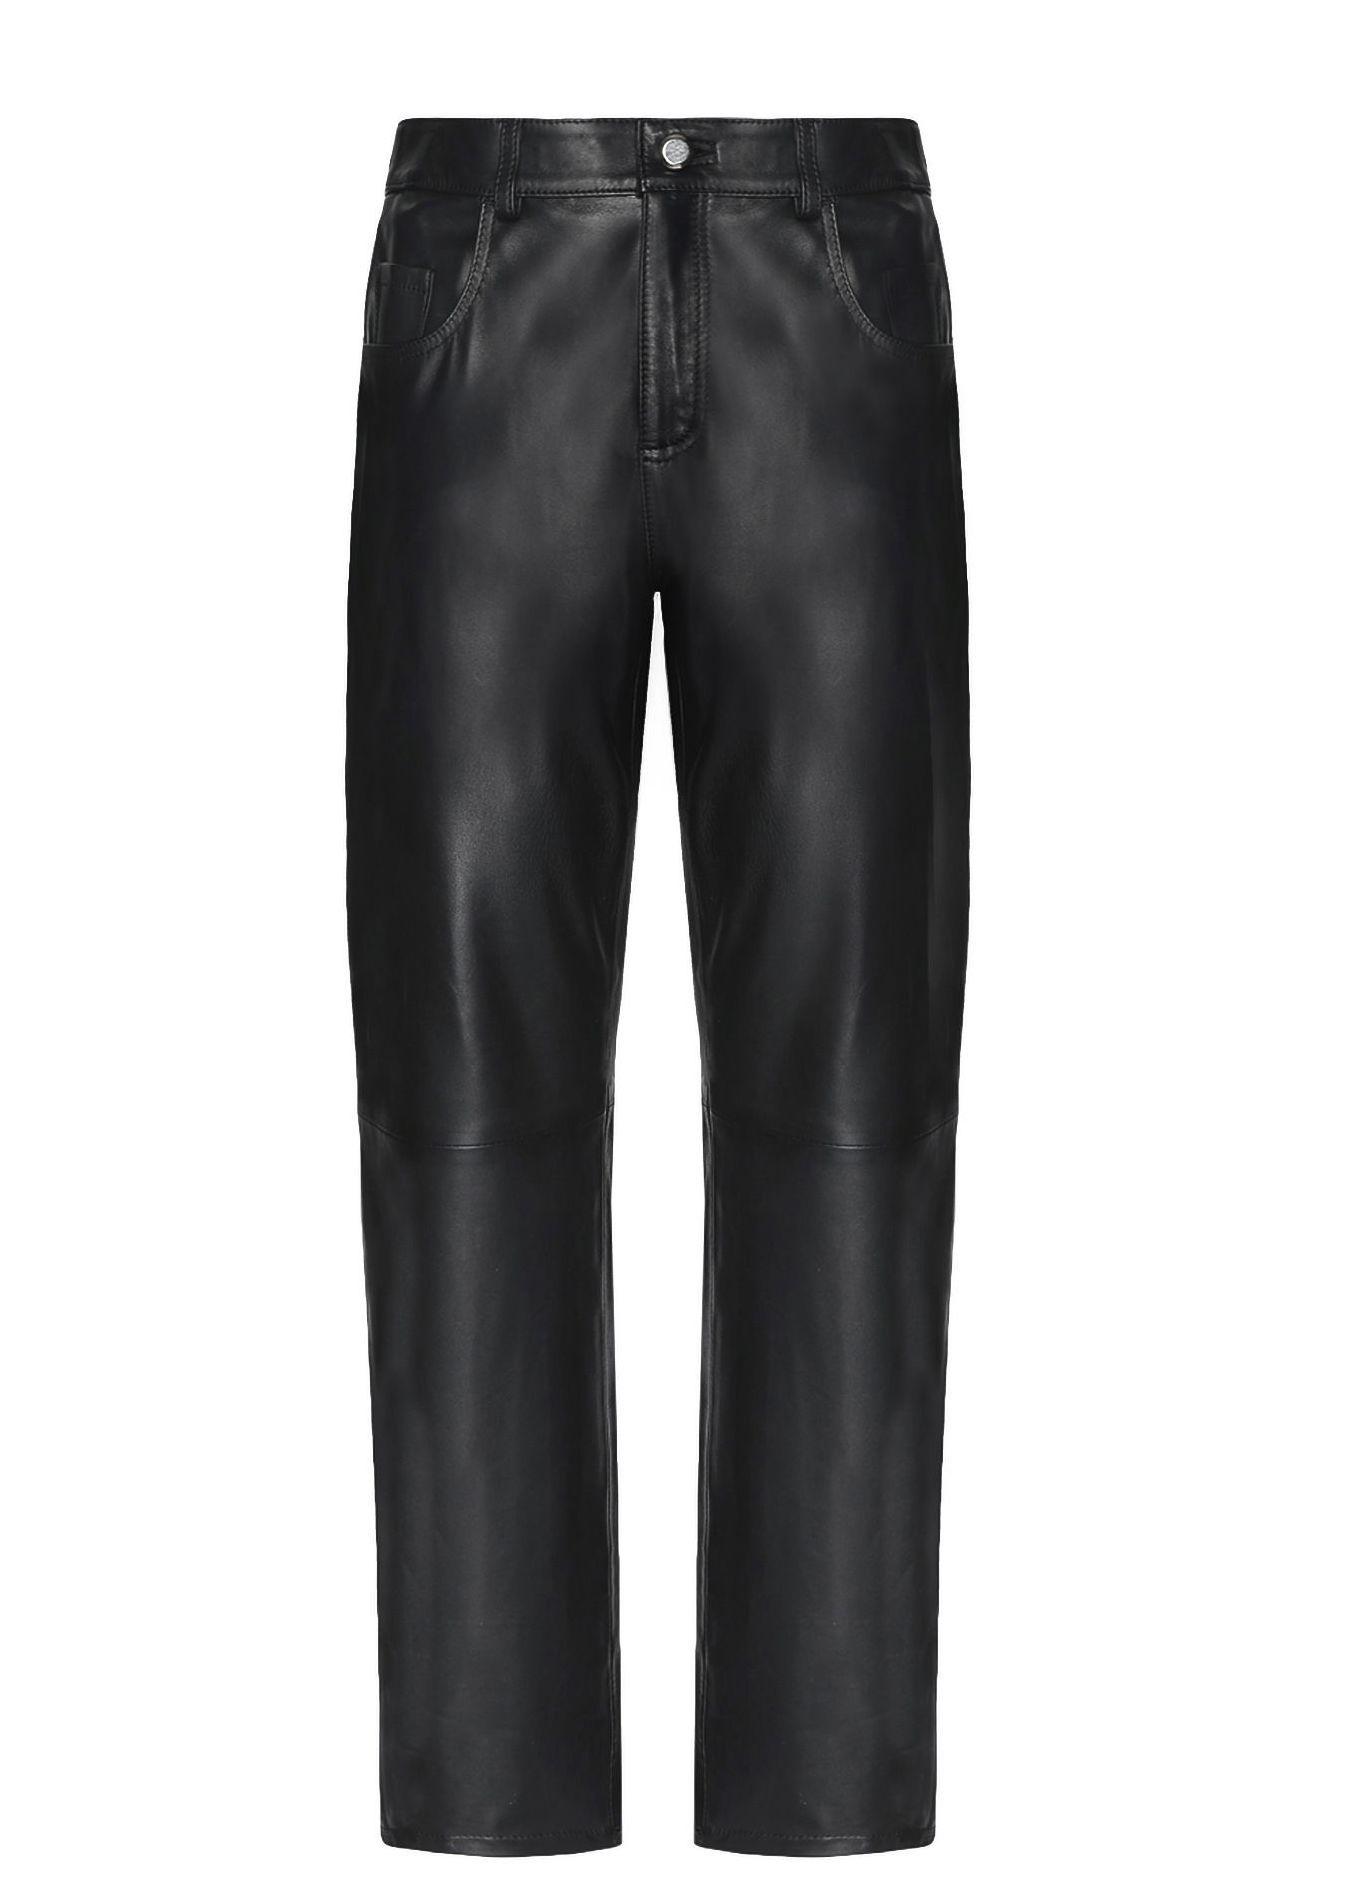 pantaloni donna pelle, pantaloni di pelle, pantaloni di pelle primavera estate 2019